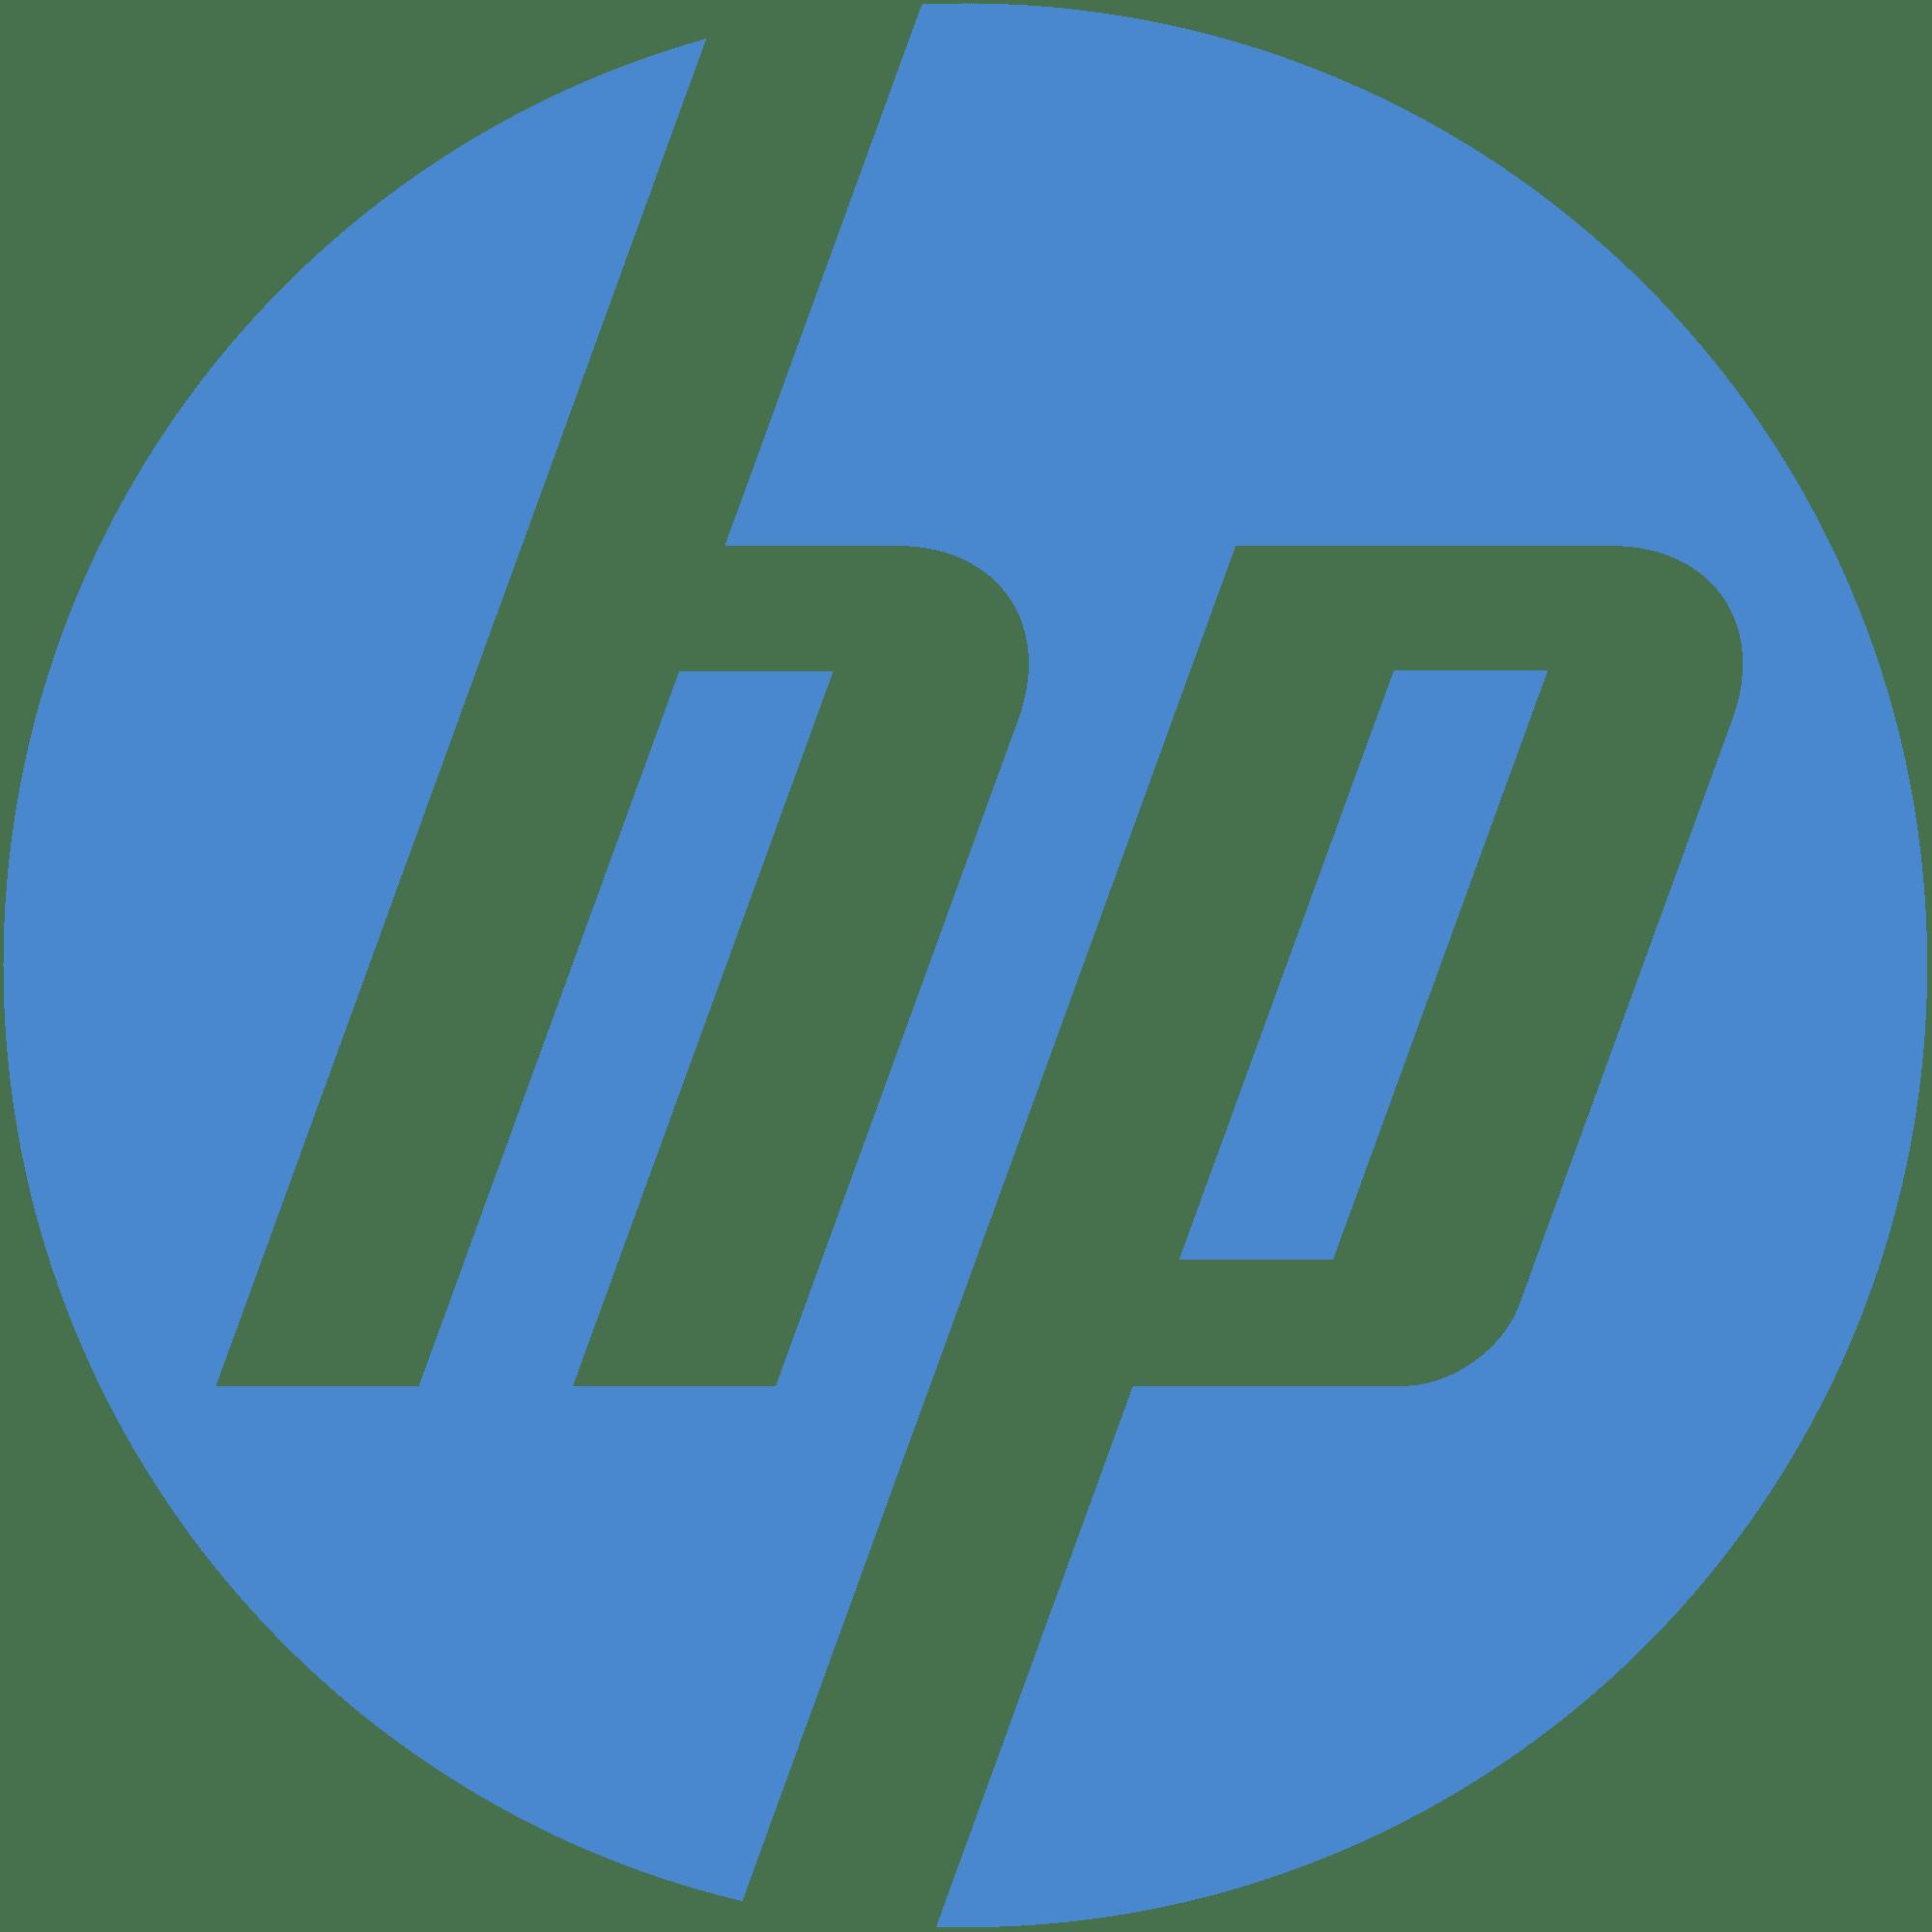 HP xw6400 Workstation drivers